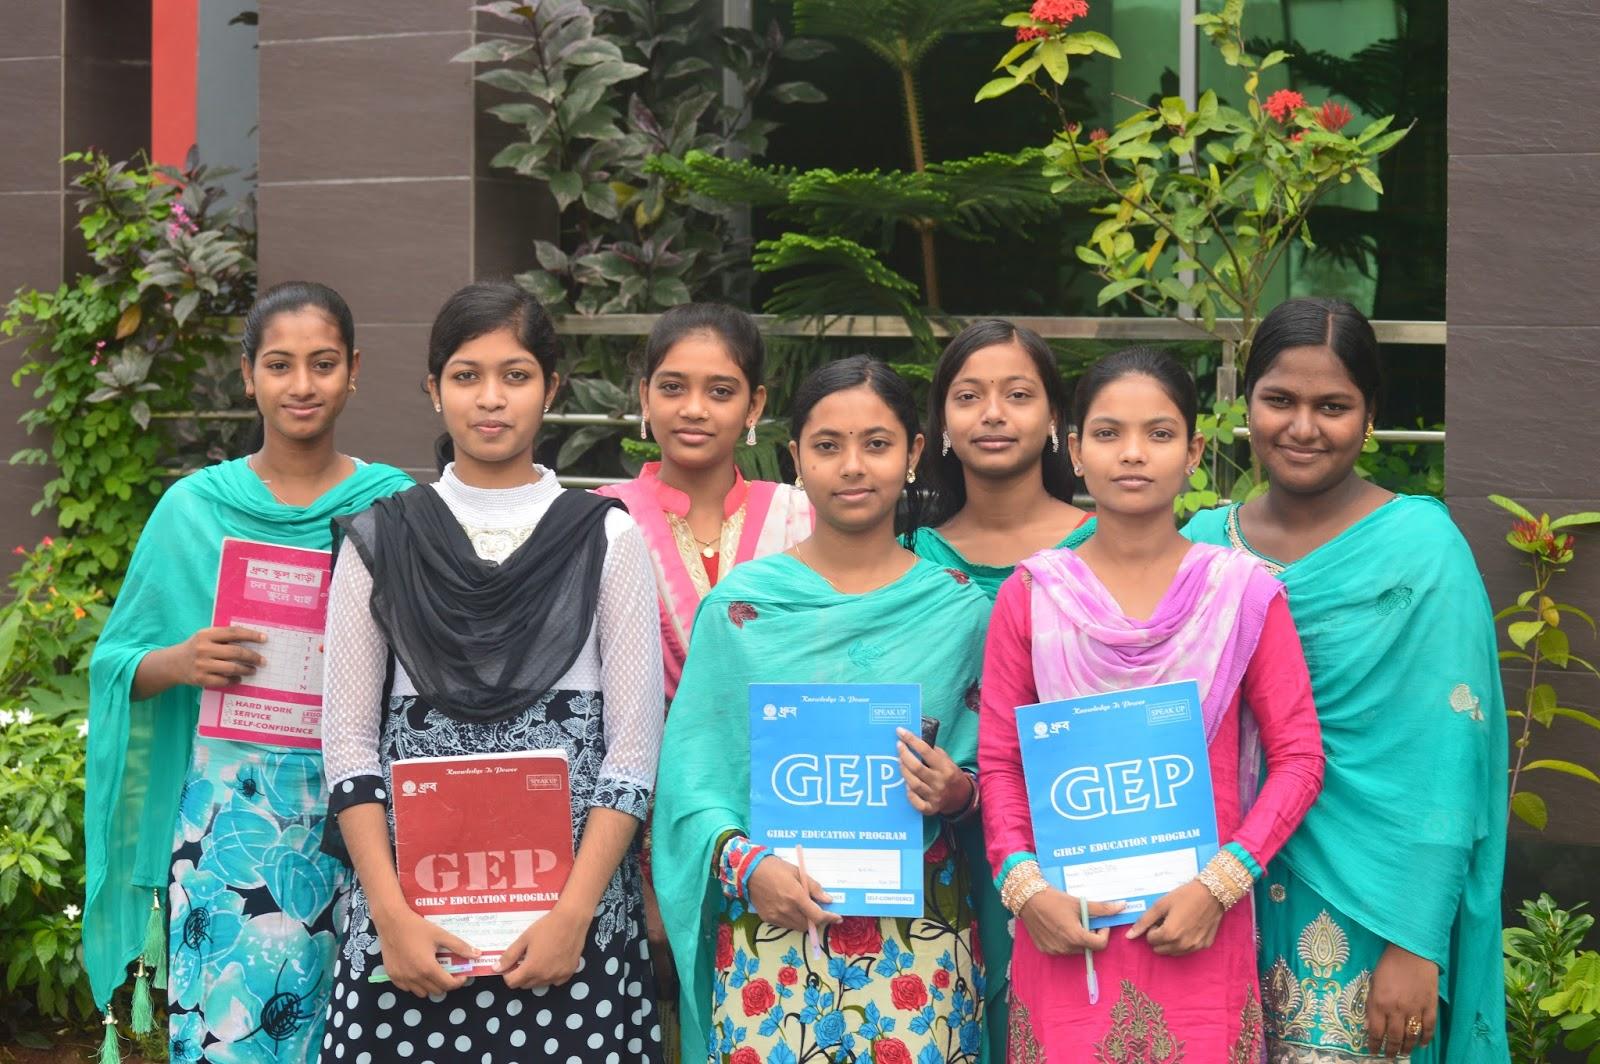 Sarkari Niyukti https://apdcl.net.in Sarkari Niyukti - Government Jobs in India - सरकारी नियुक्ति   Image Courtesy - https://3.bp.blogspot.com/-jDY6GtcHYbQ/V48bImtECTI/AAAAAAAAALU/yHWDQ1emV84A3fQPdJ29tAExBzYNjDkDwCLcB/s1600/11th%2Bgraders%2Bfirst%2Bday.jpg